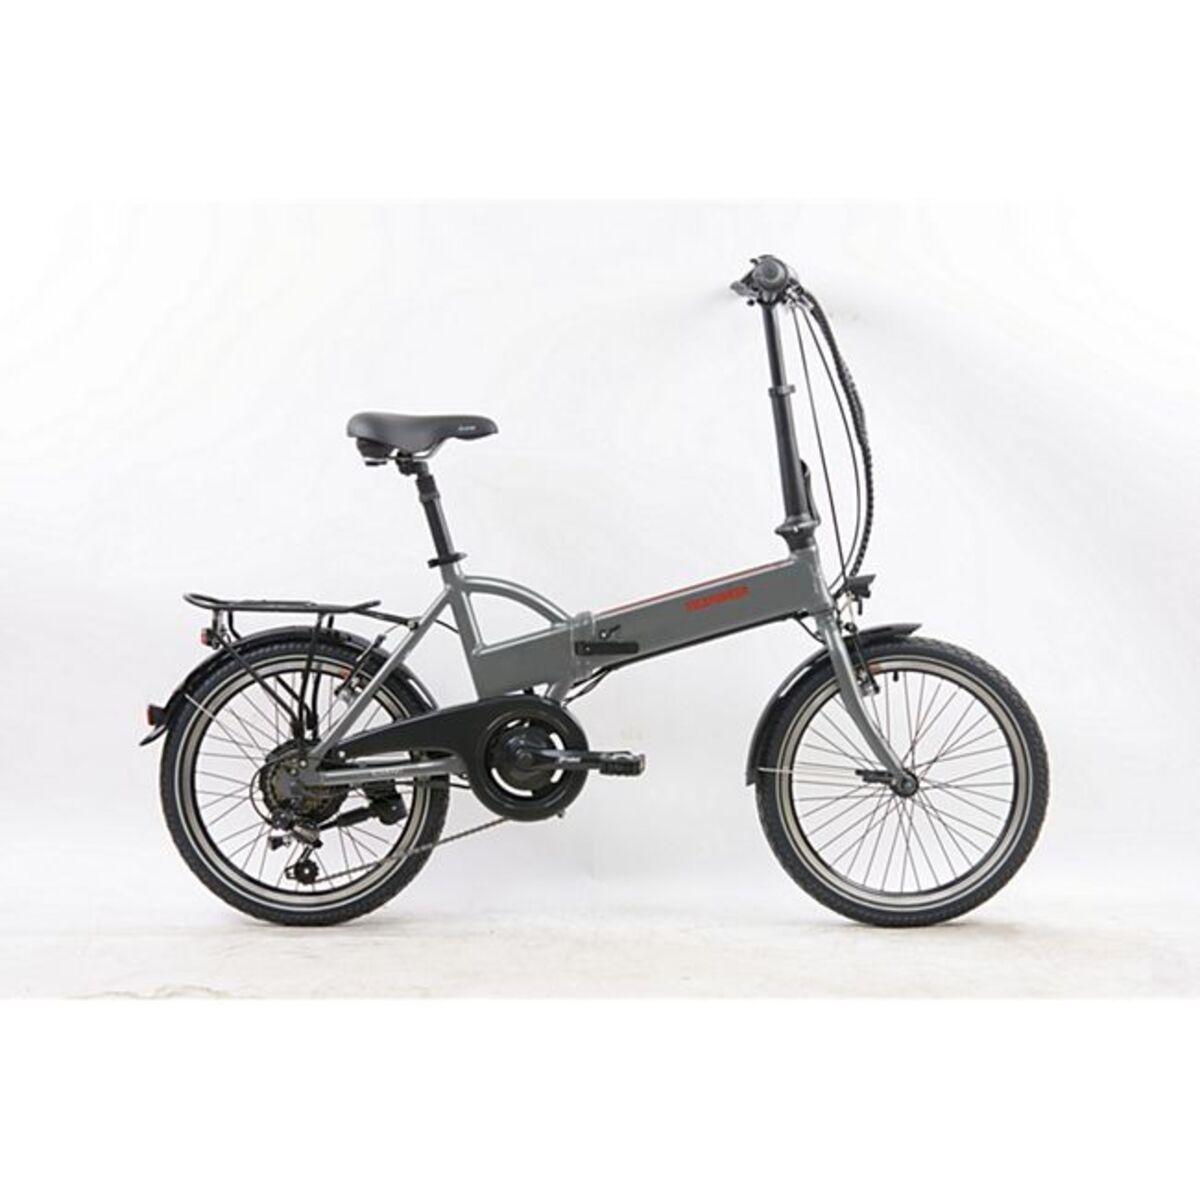 "Bild 1 von Telefunken 20"" Alu Falt E-Bike kompakt F820"